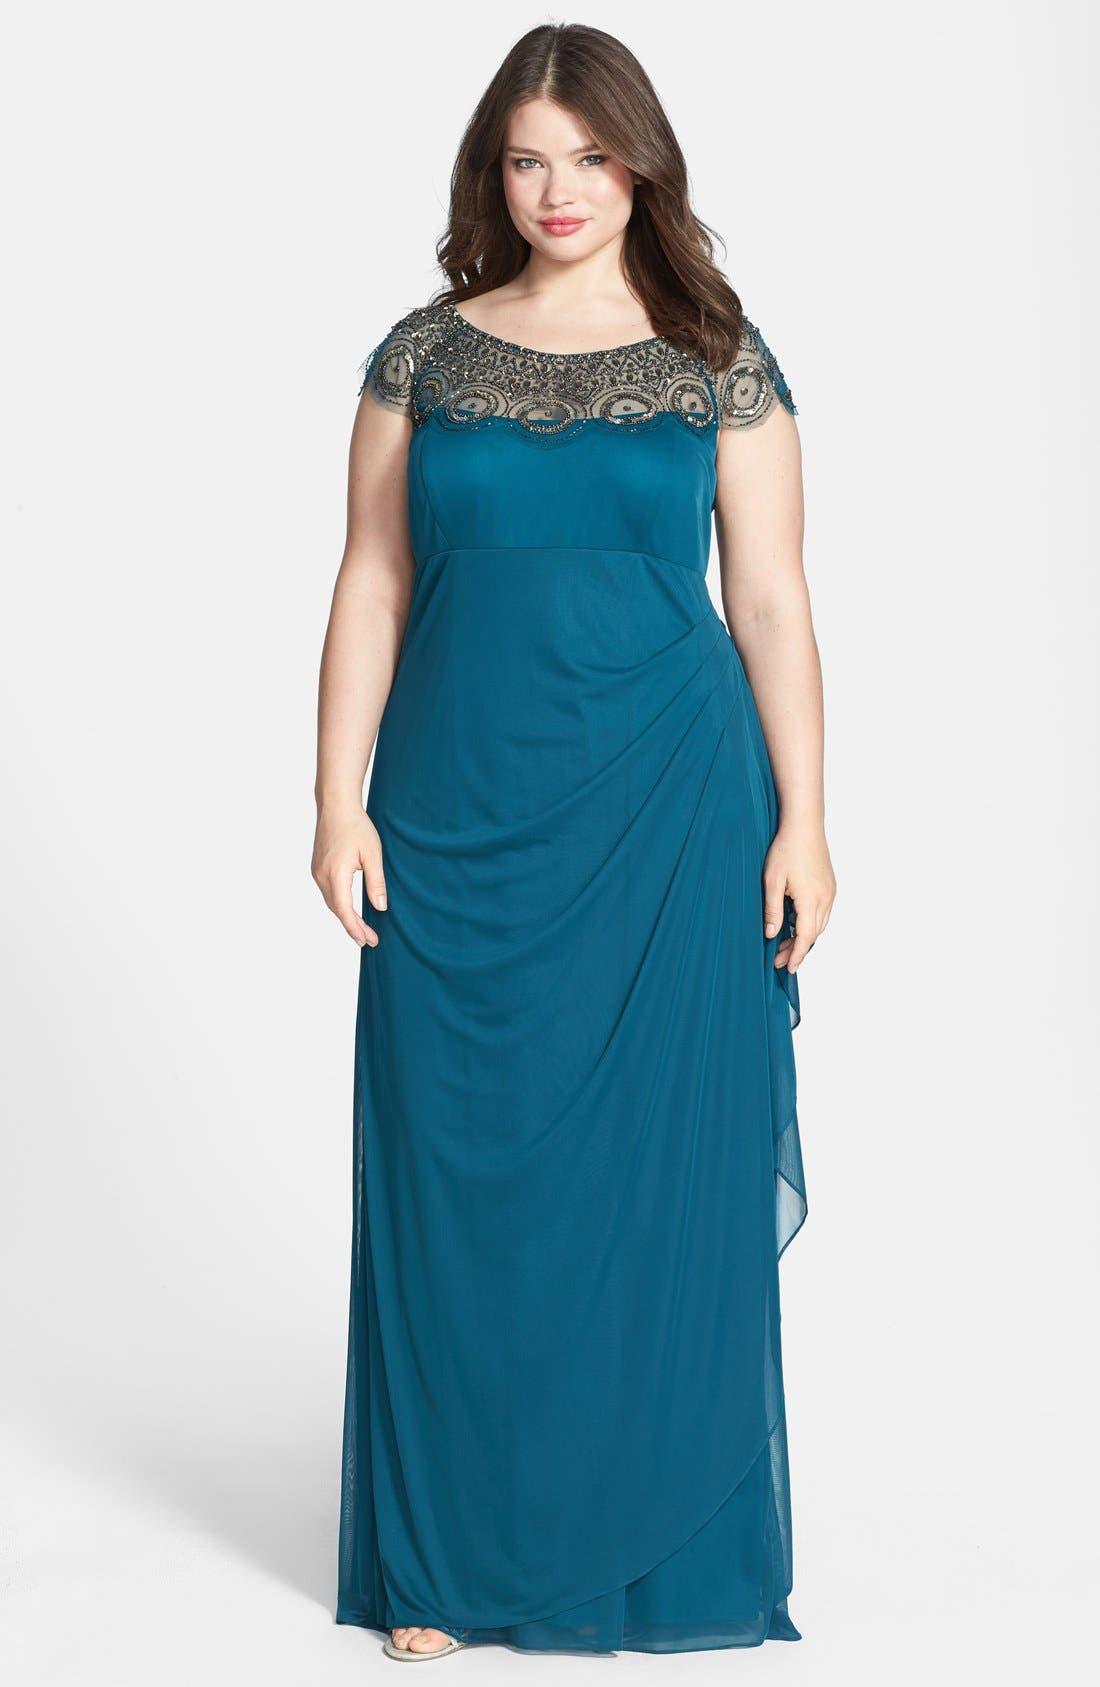 Alternate Image 1 Selected - Xscape Embellished Yoke Matte Jersey Gown (Plus Size)